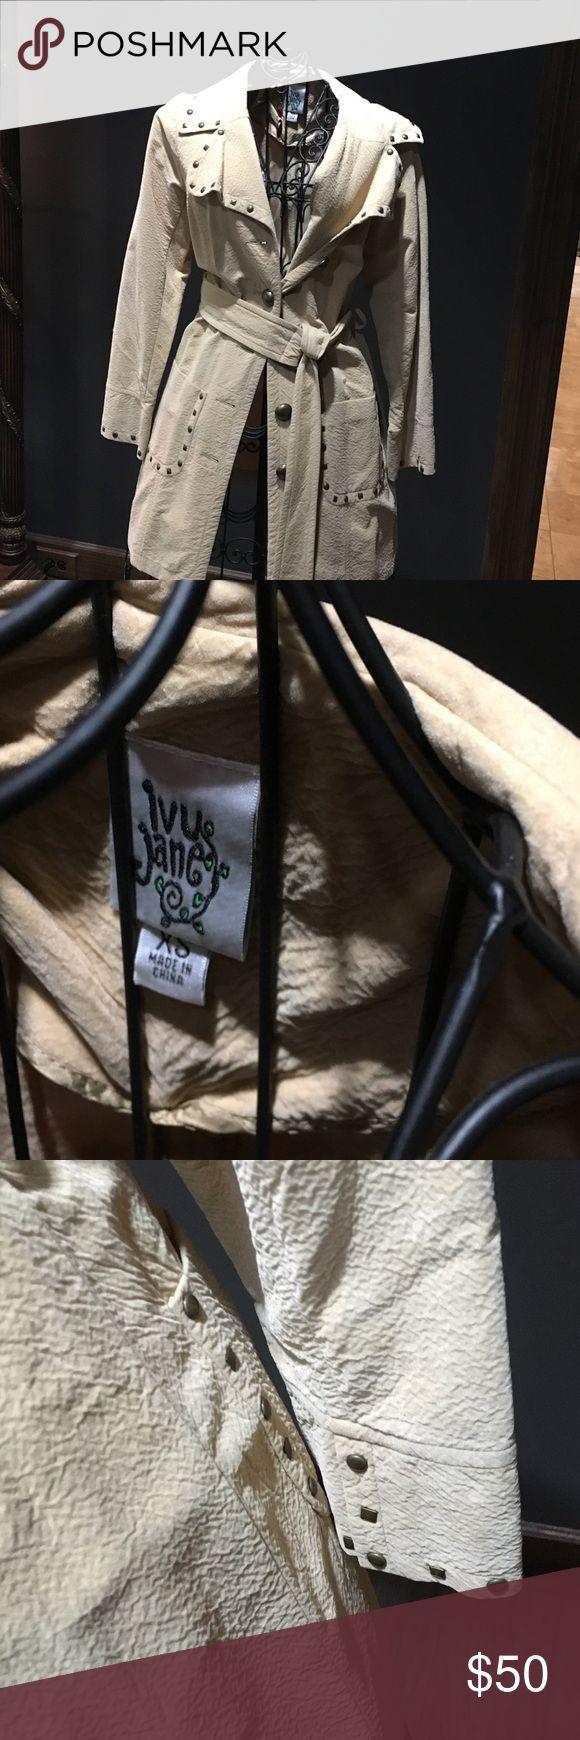 Cream jacket Jacket cream with belt and studs Jackets & Coats Blazers